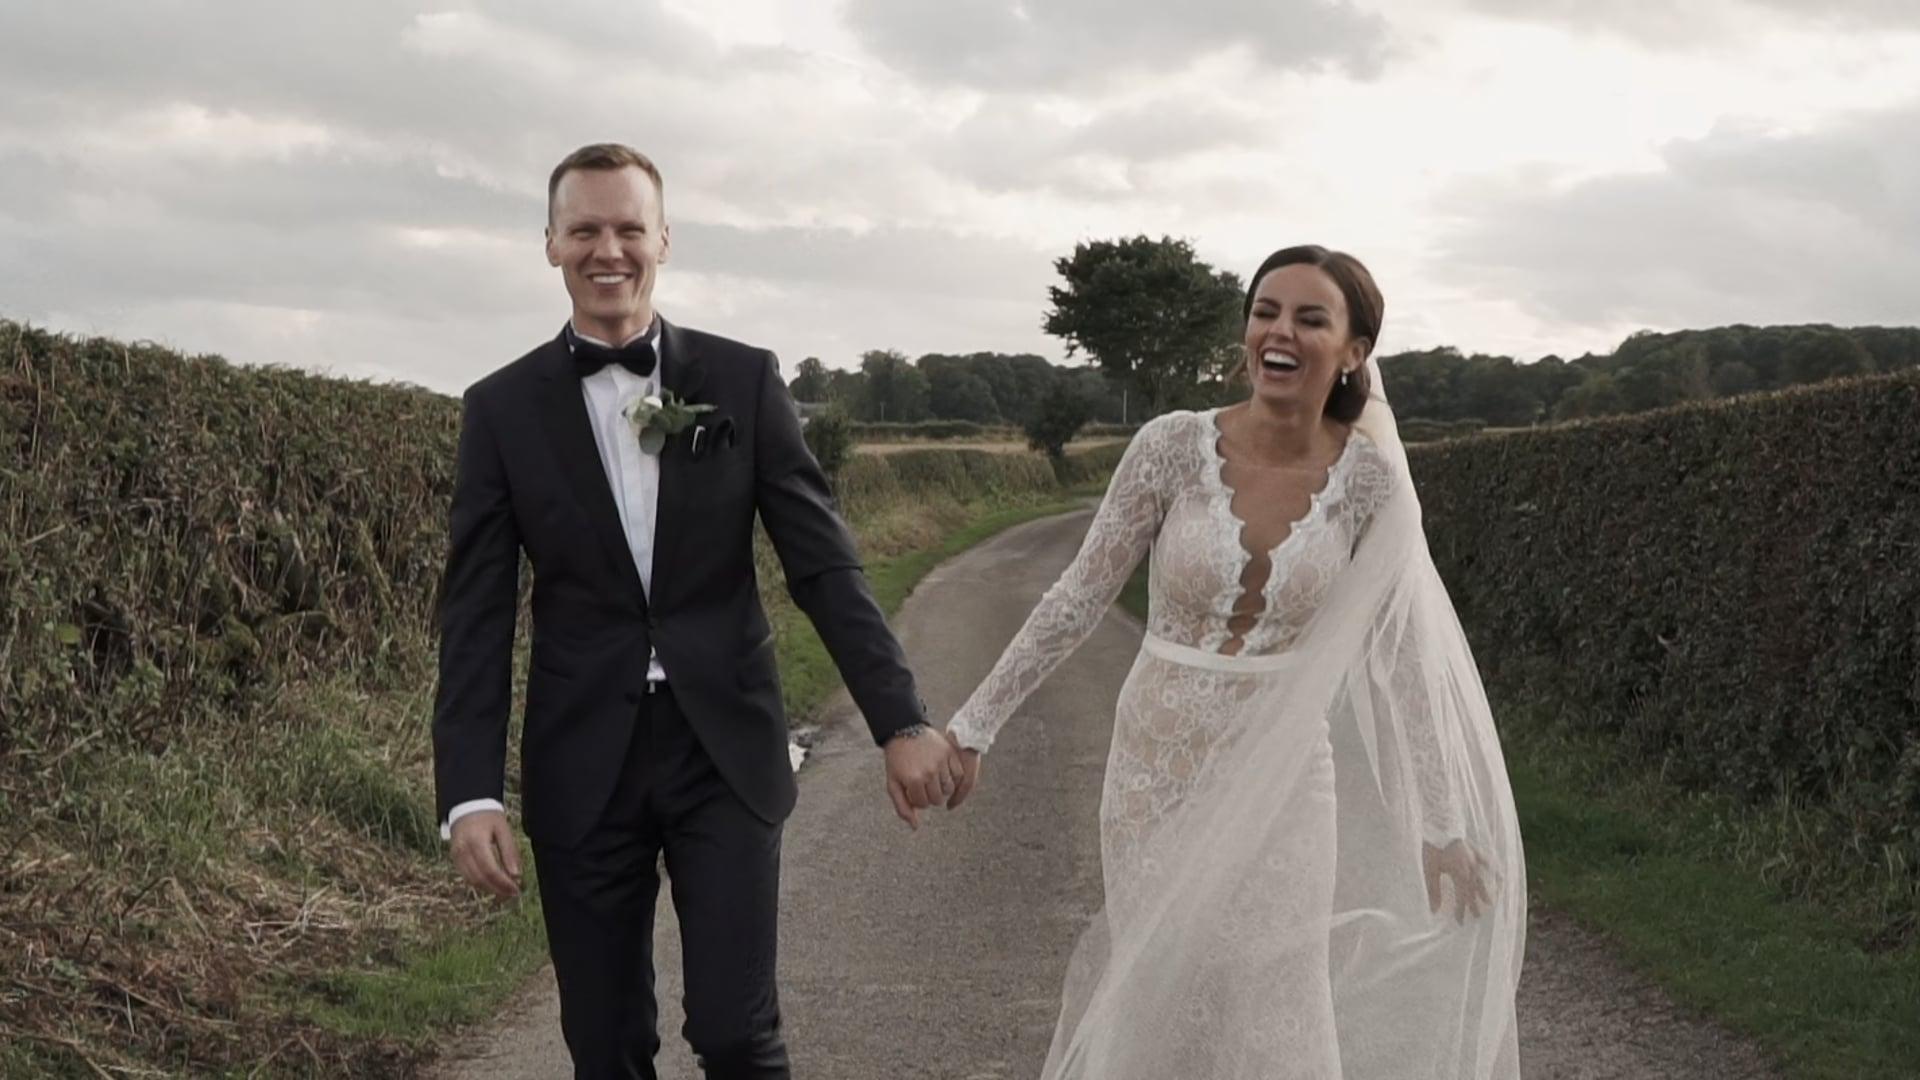 Kate + Josh // Doxford Barns